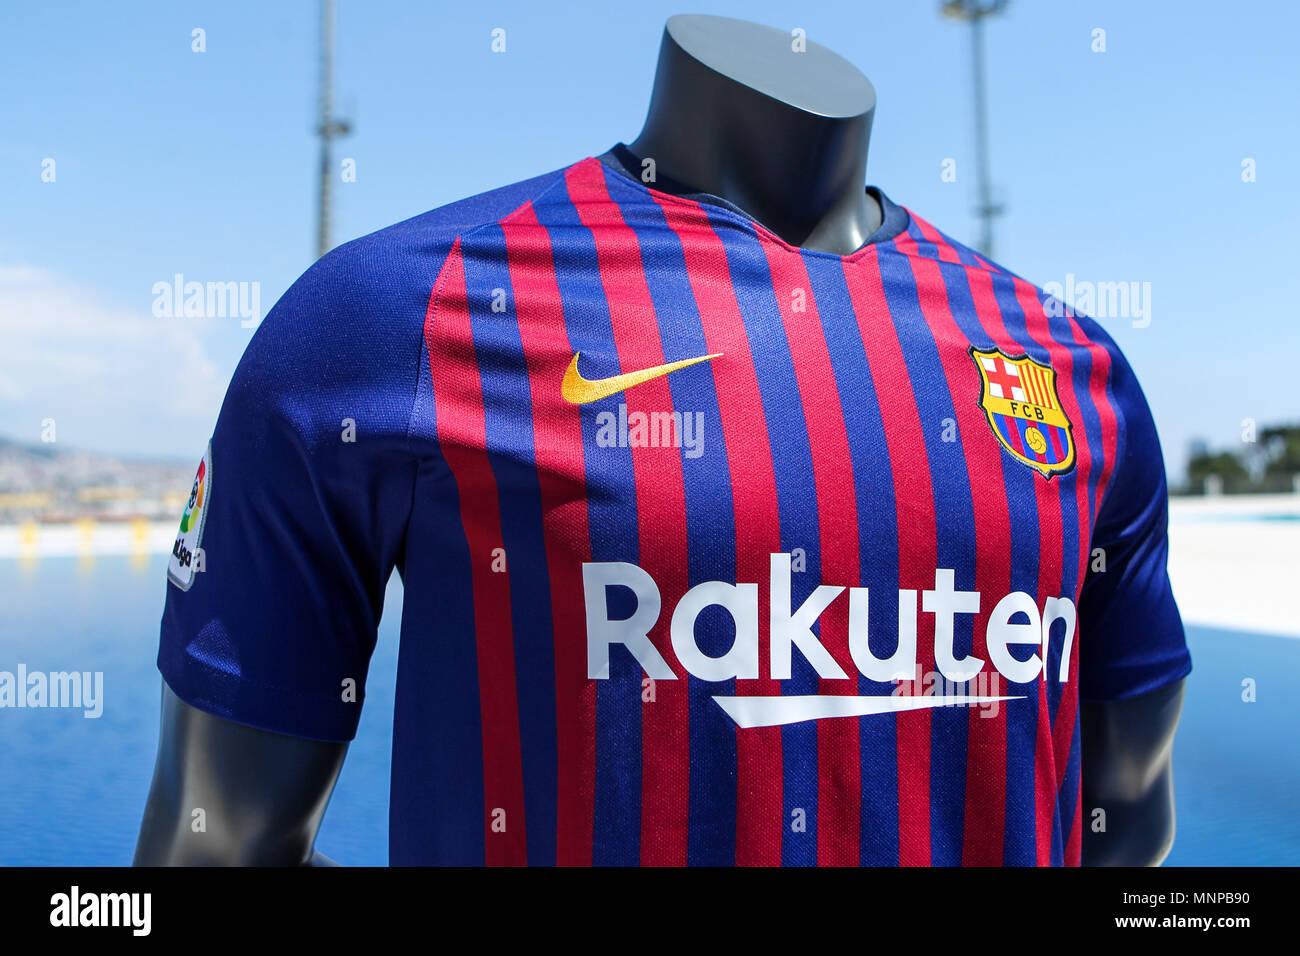 pretty nice a4b2d 01c4a Piscines de Montjuic, Barcelona, Spain 19th May 2018. FC ...